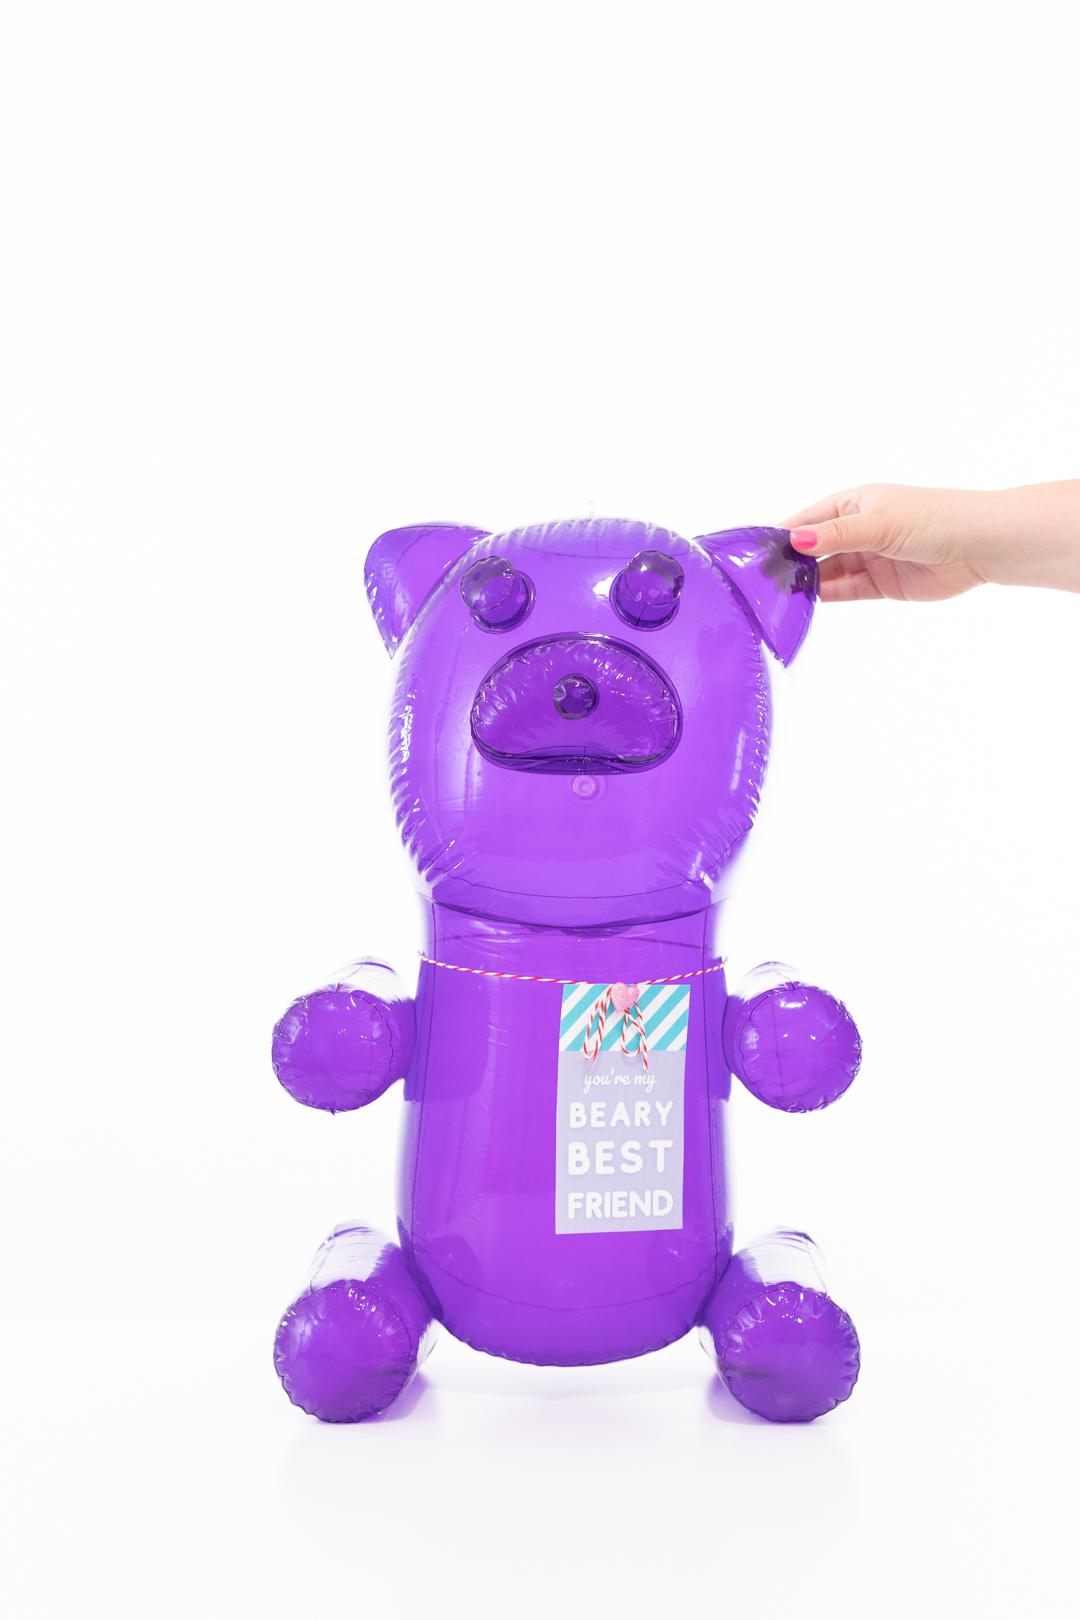 huge purple blow up gummy bear novelty